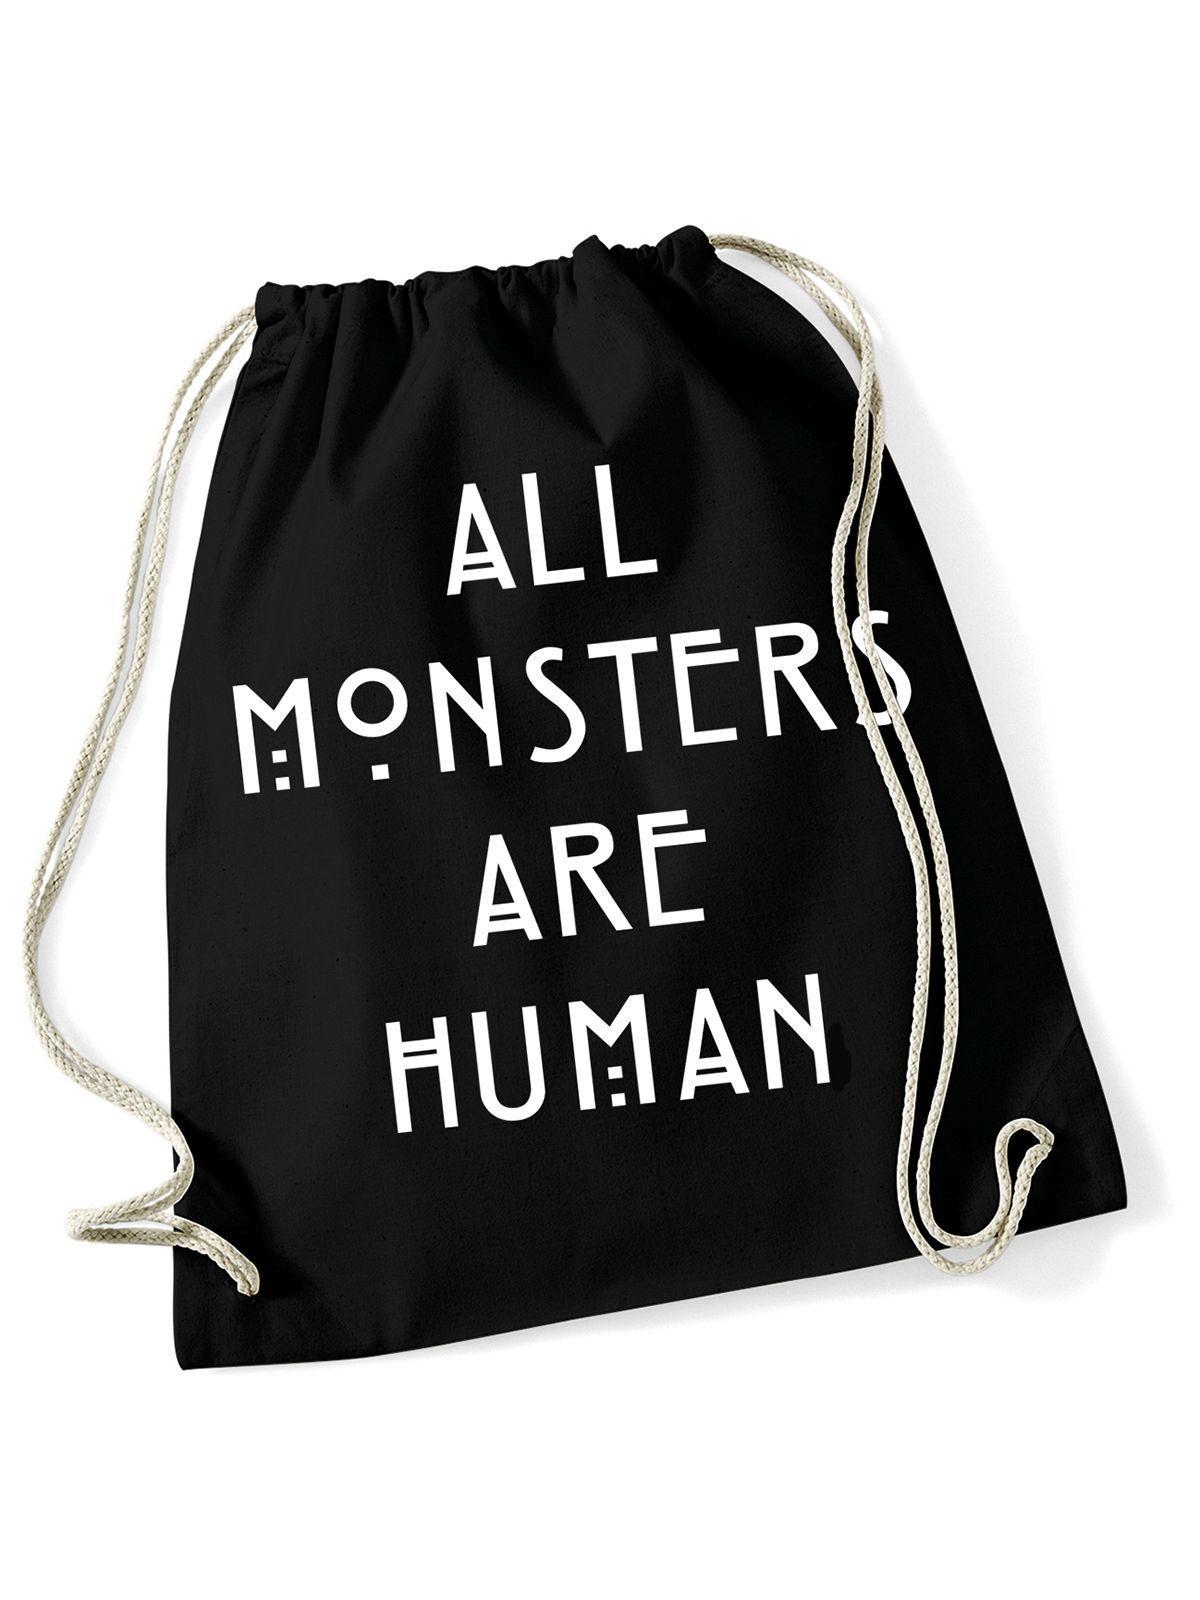 Sporttaschen - American Horror Story All Monsters Turnbeutel schwarz  - Onlineshop NAPO Shop